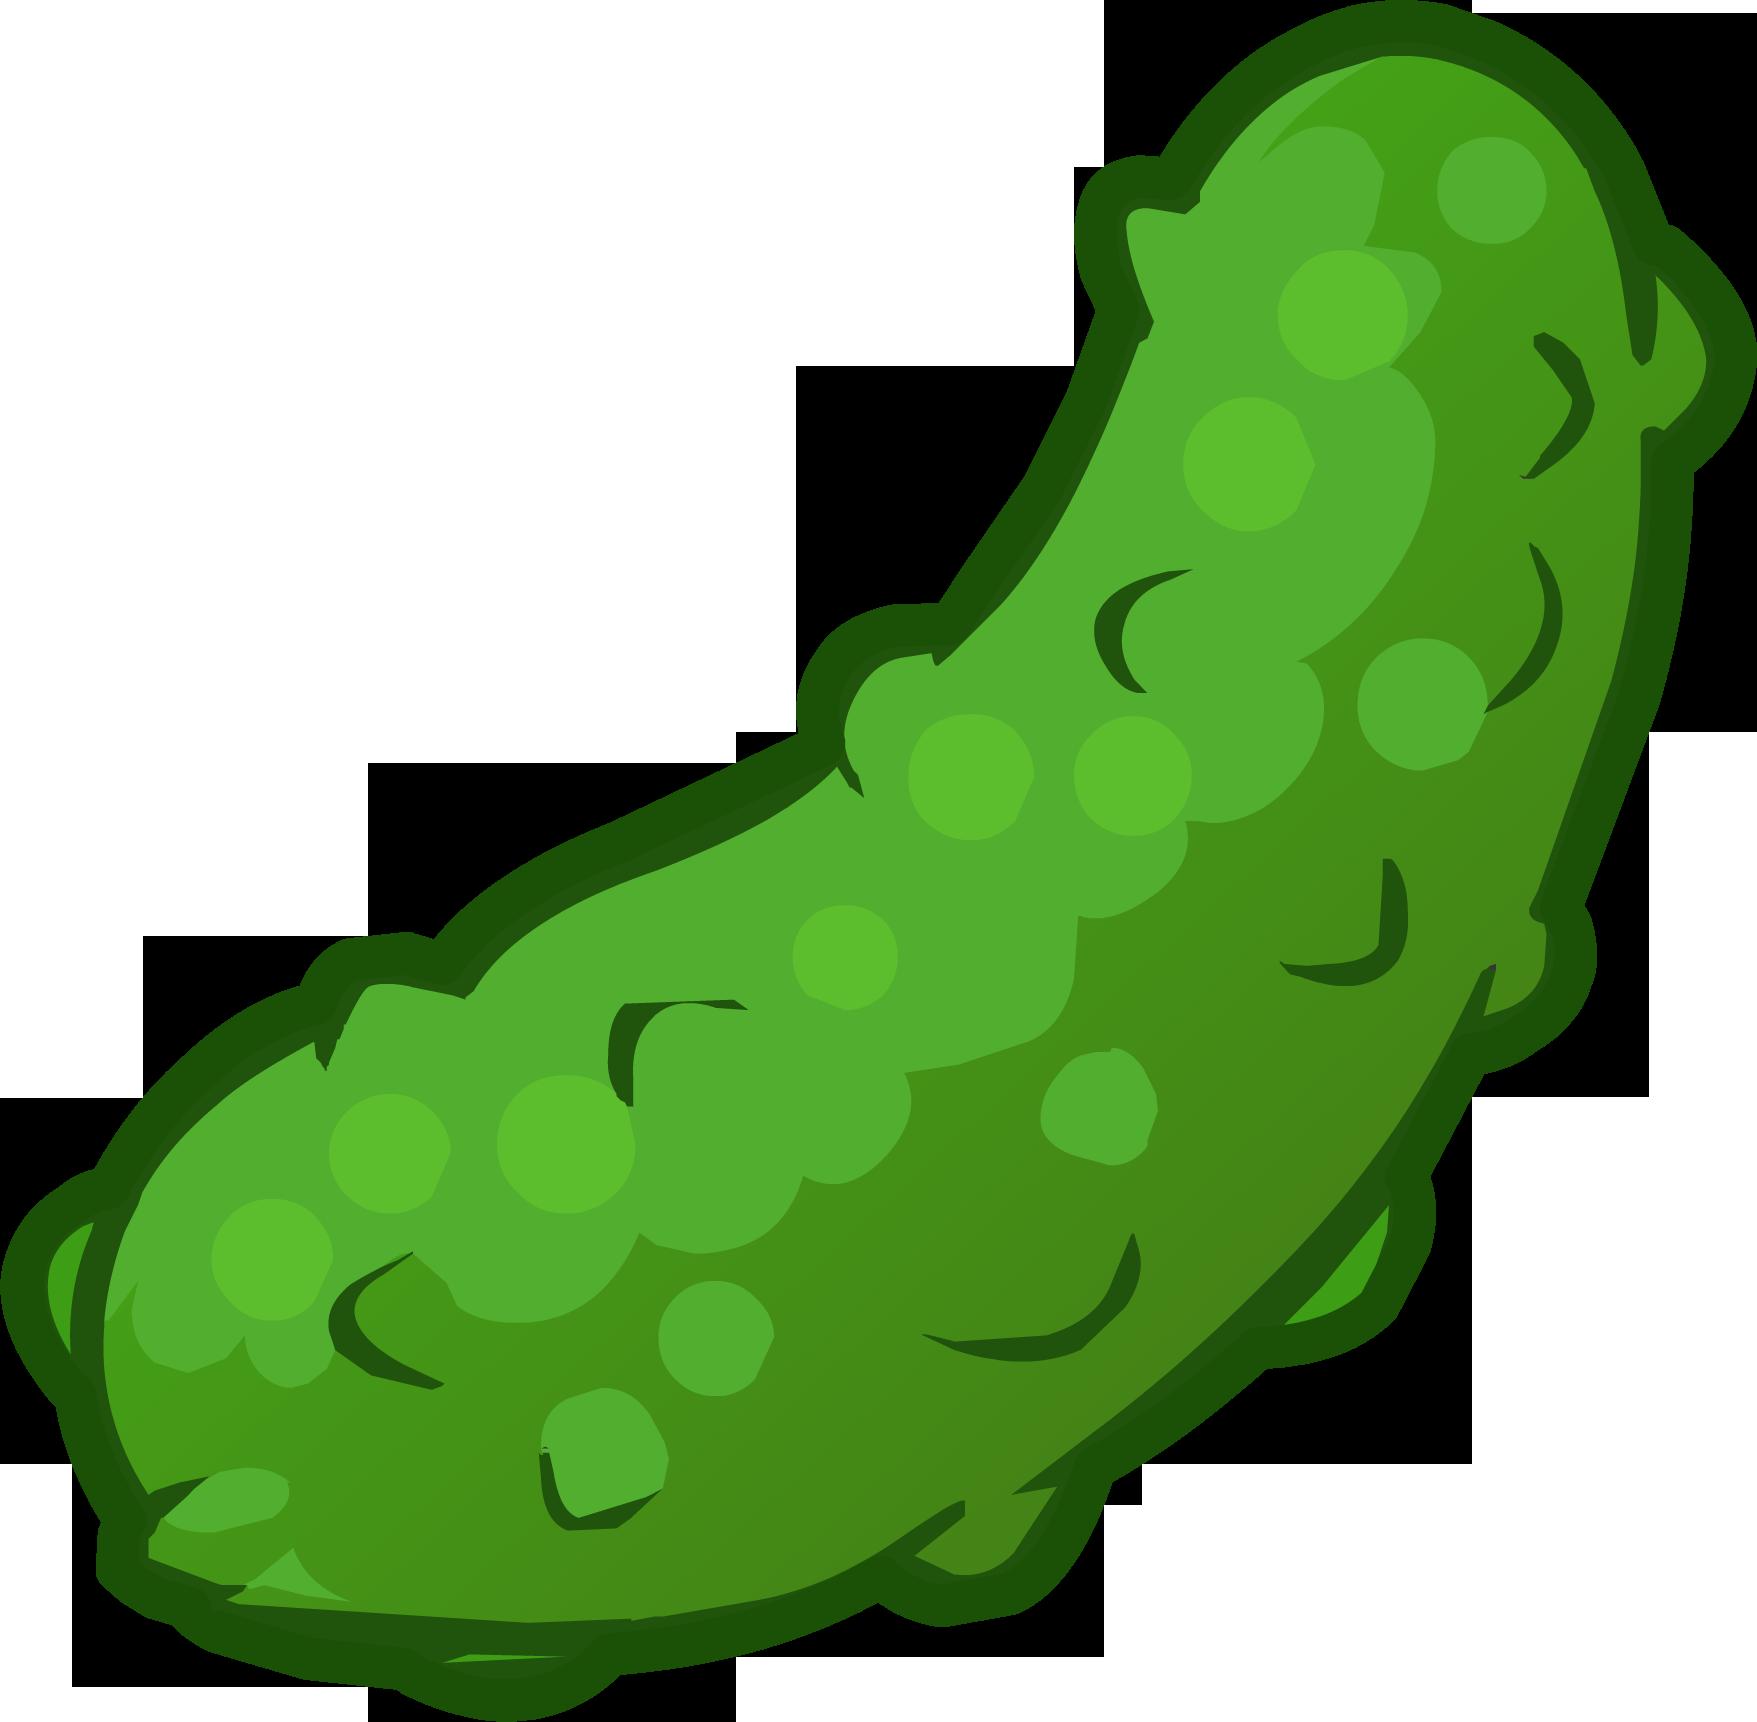 image - pickle | club penguin wiki | fandom poweredwikia